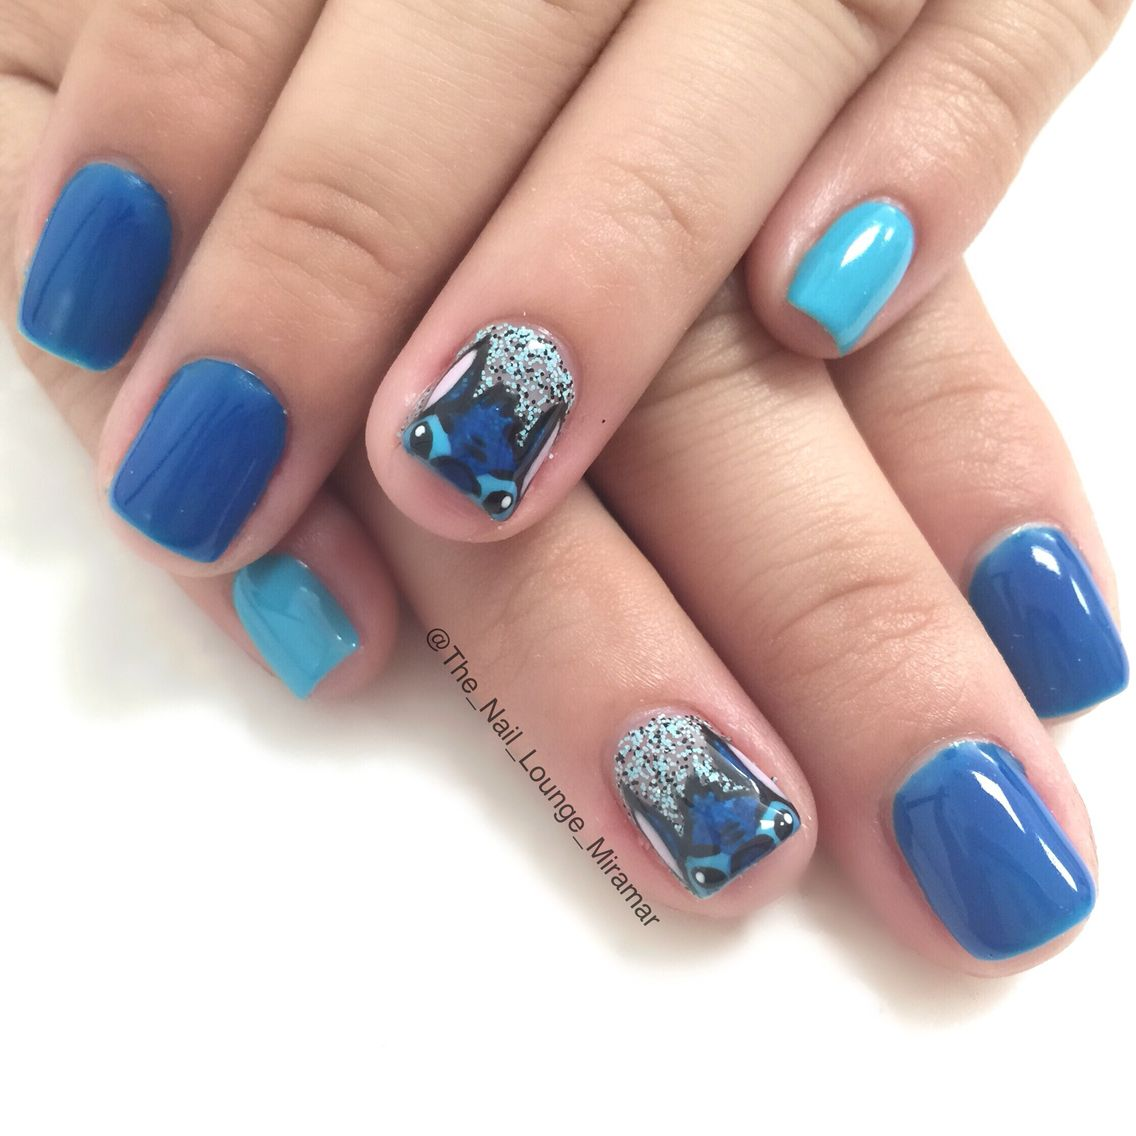 LILO and stitch nail art design | Disney | Pinterest